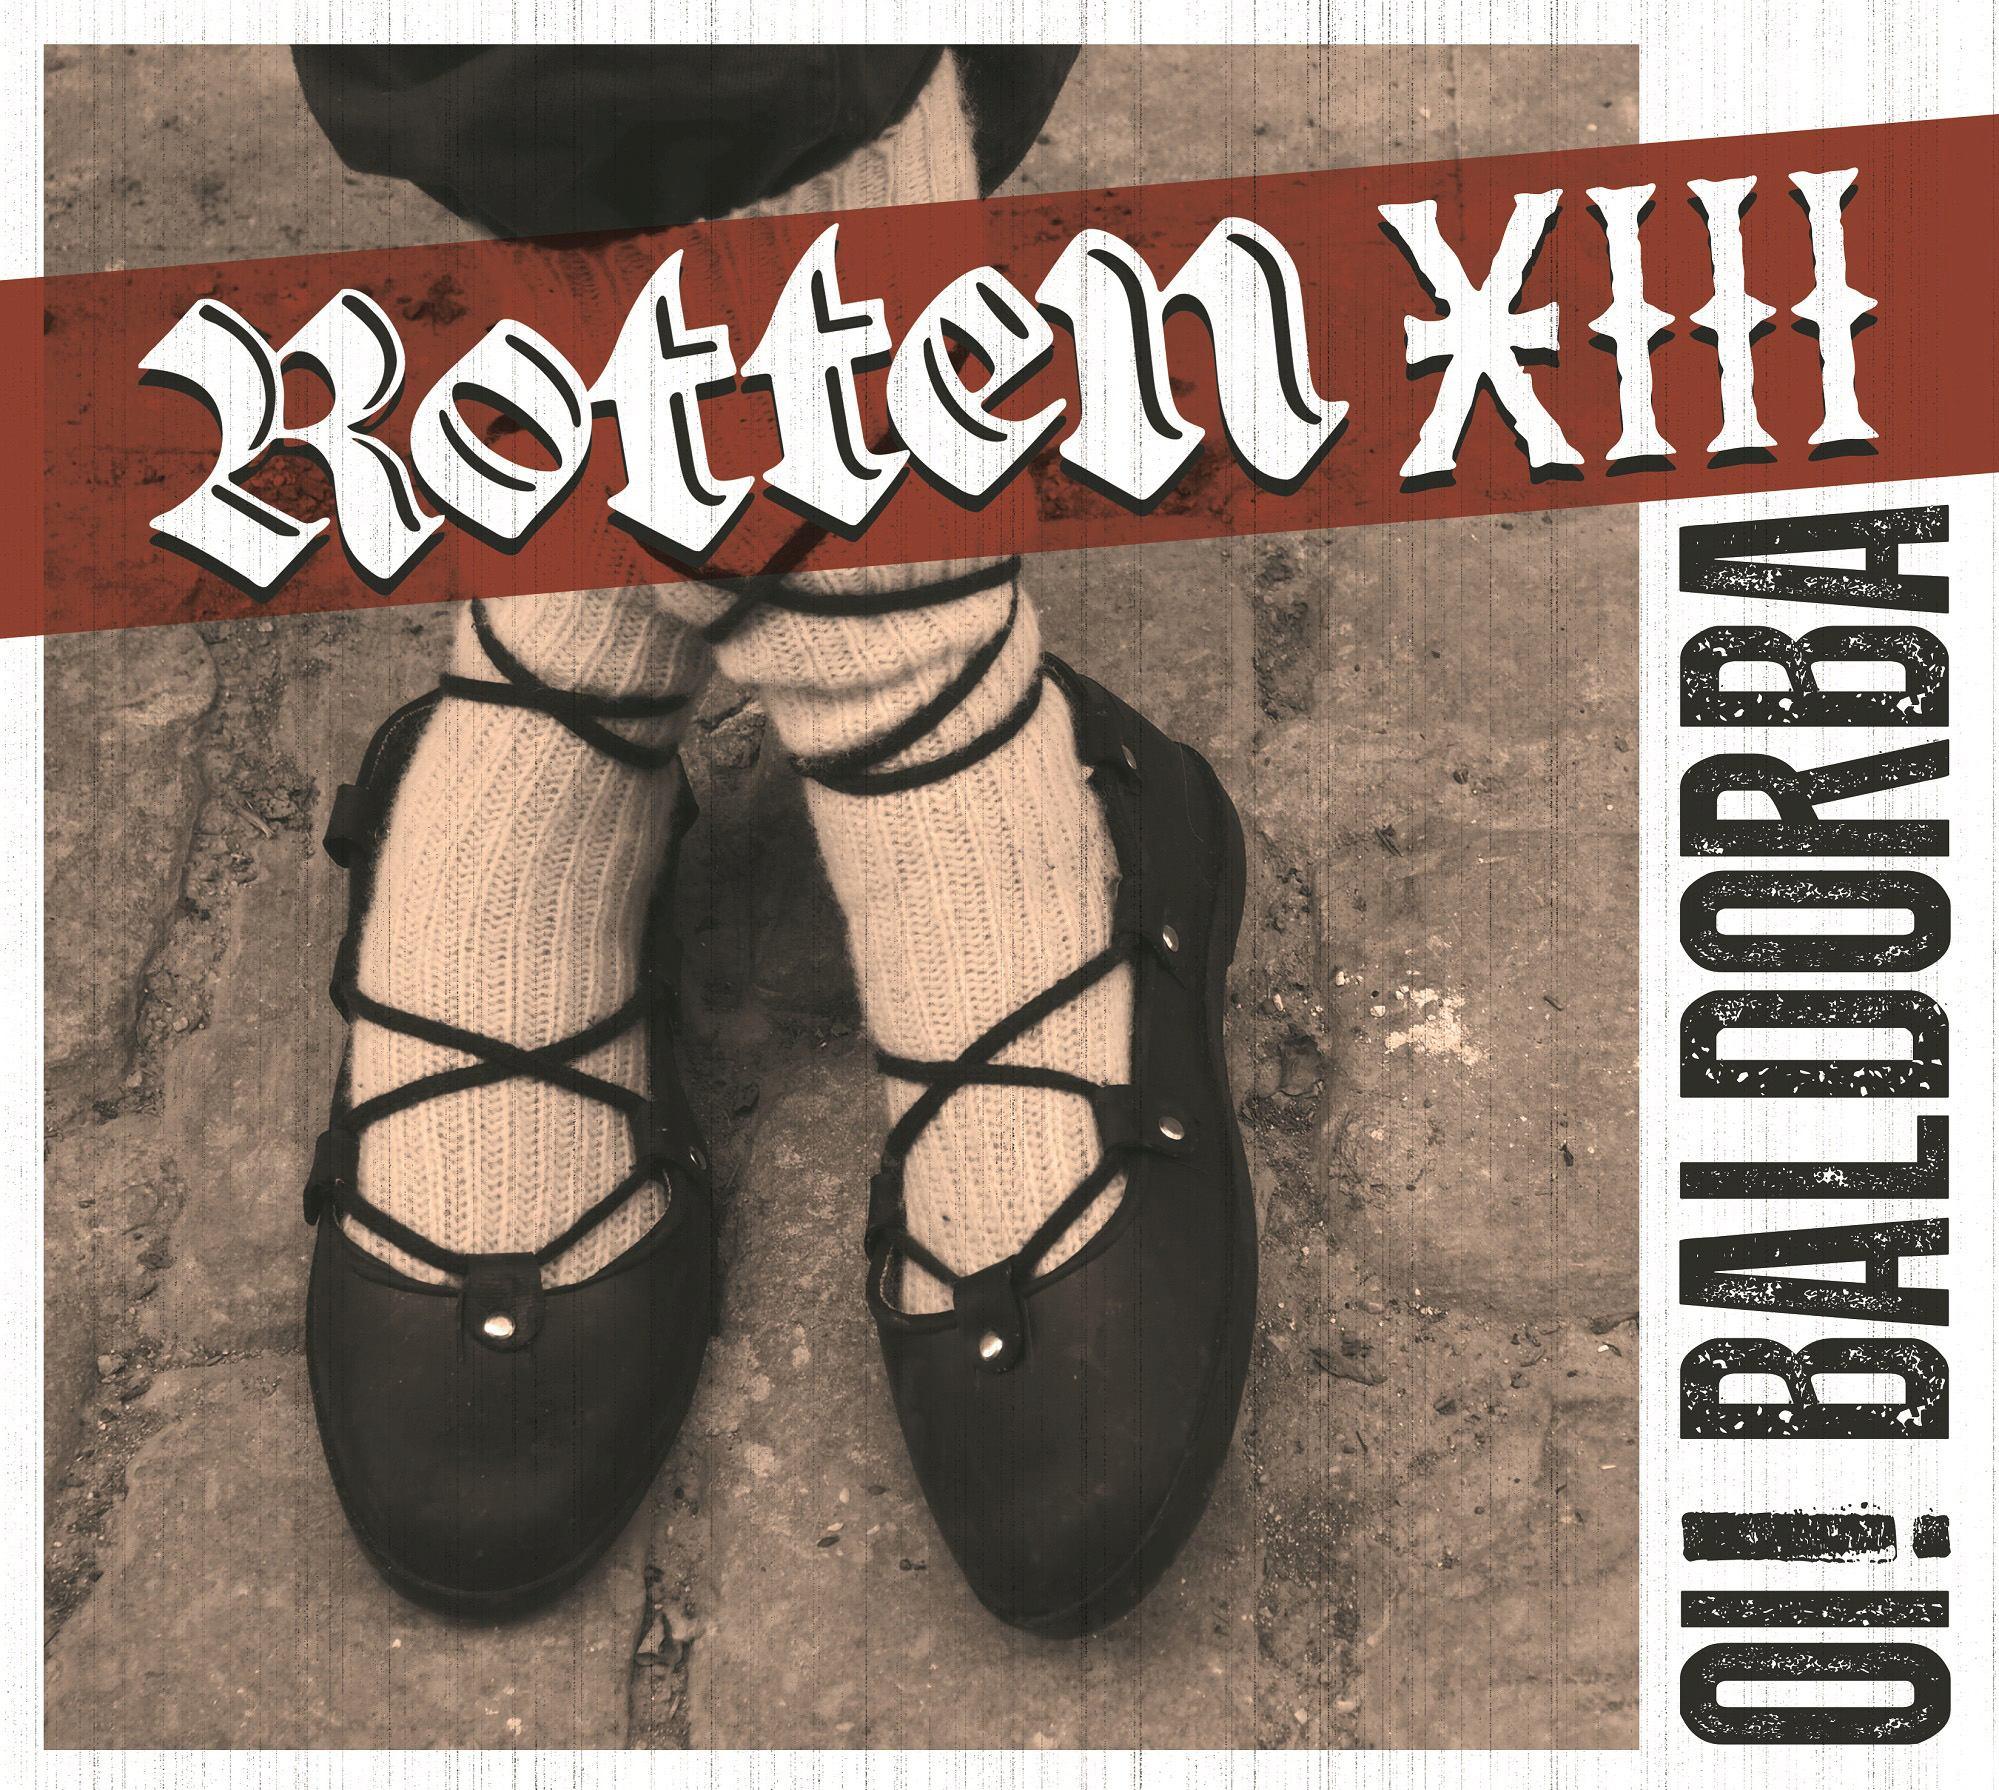 portada del album Oi! Baldorba